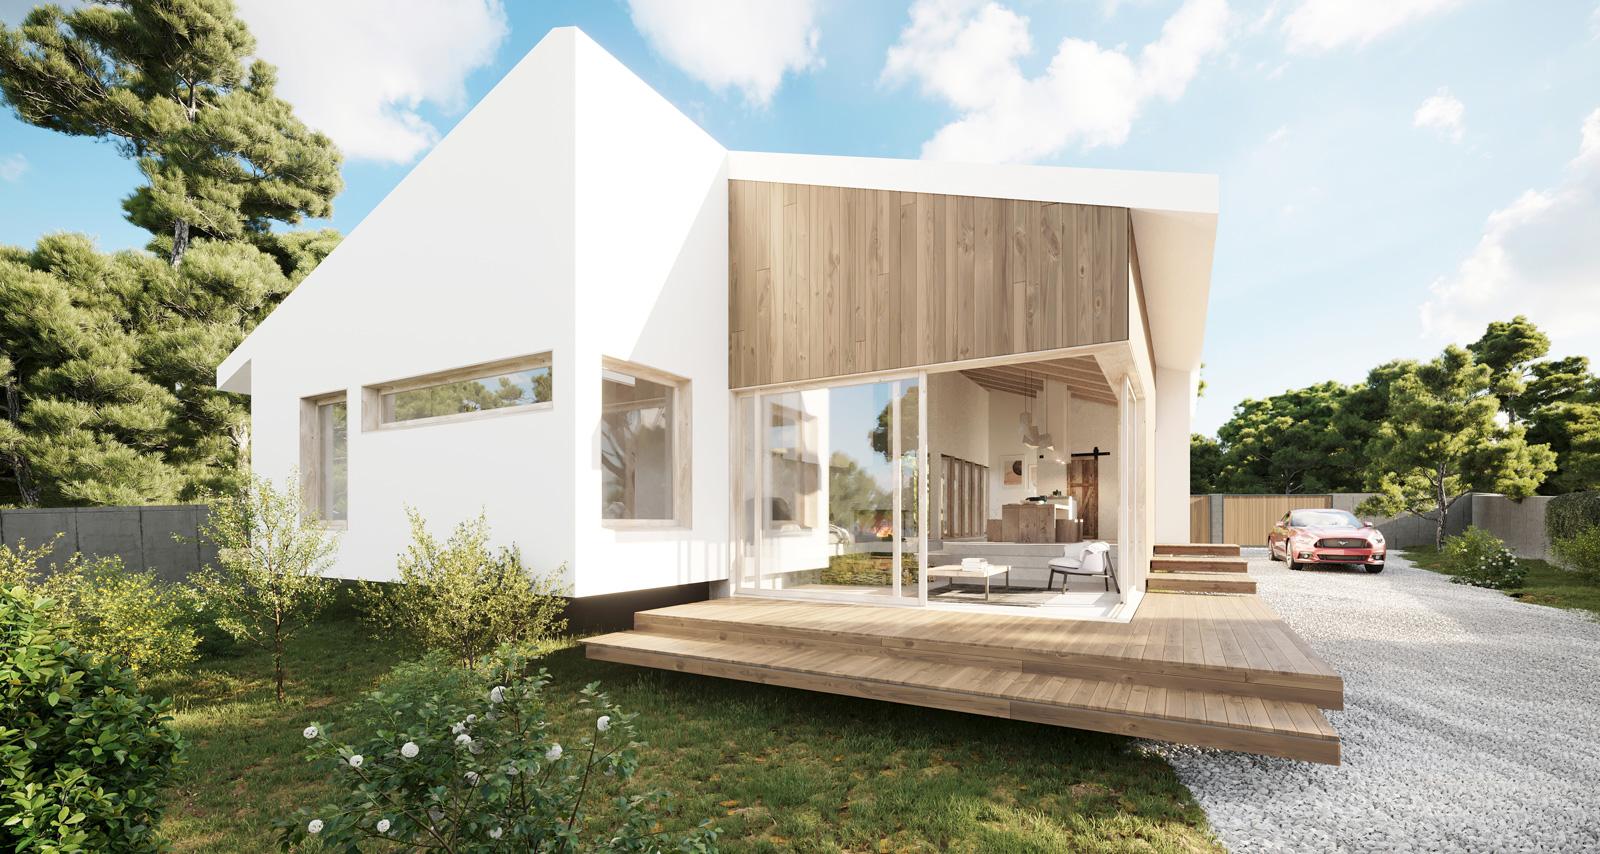 estudio de arquitectura en belmonte